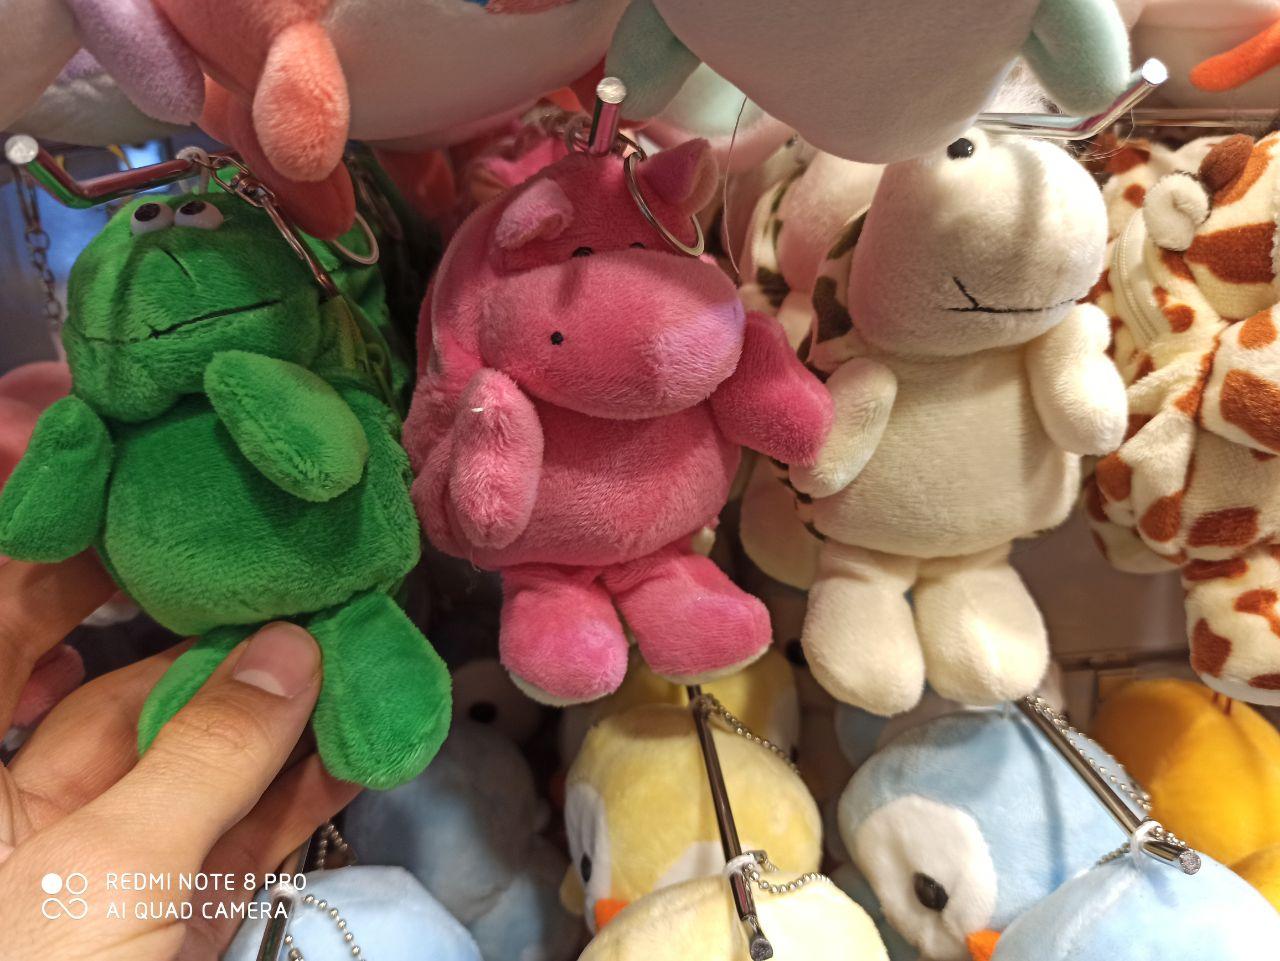 پخش عمده انواع لوازم تزیینی و کادویی جاسوییچی عروسکی طرح حیوانات